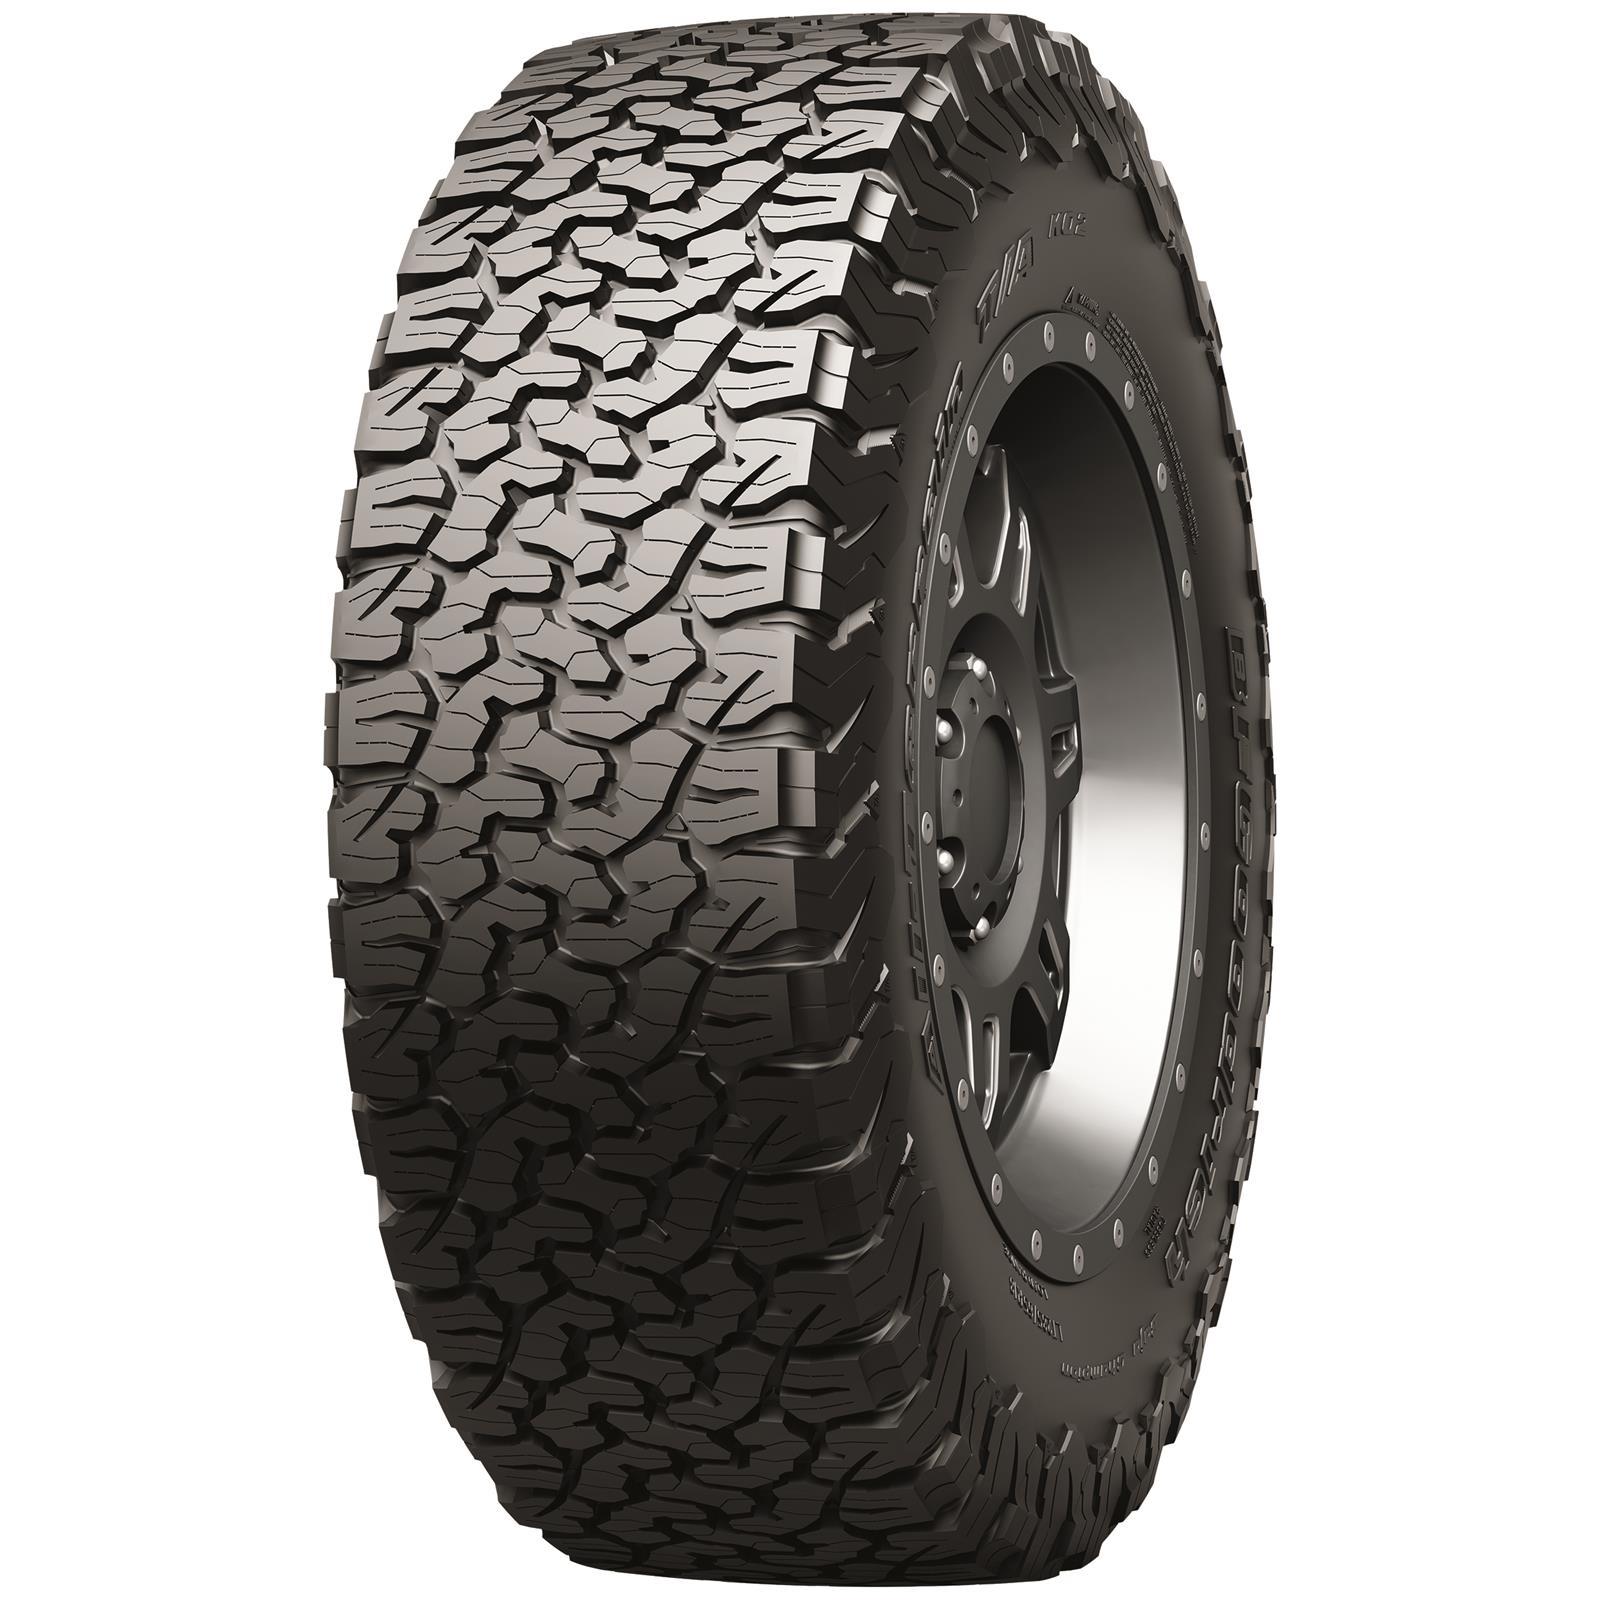 BFGoodrich All Terrain T A KO2 Tires Free Shipping on Orders